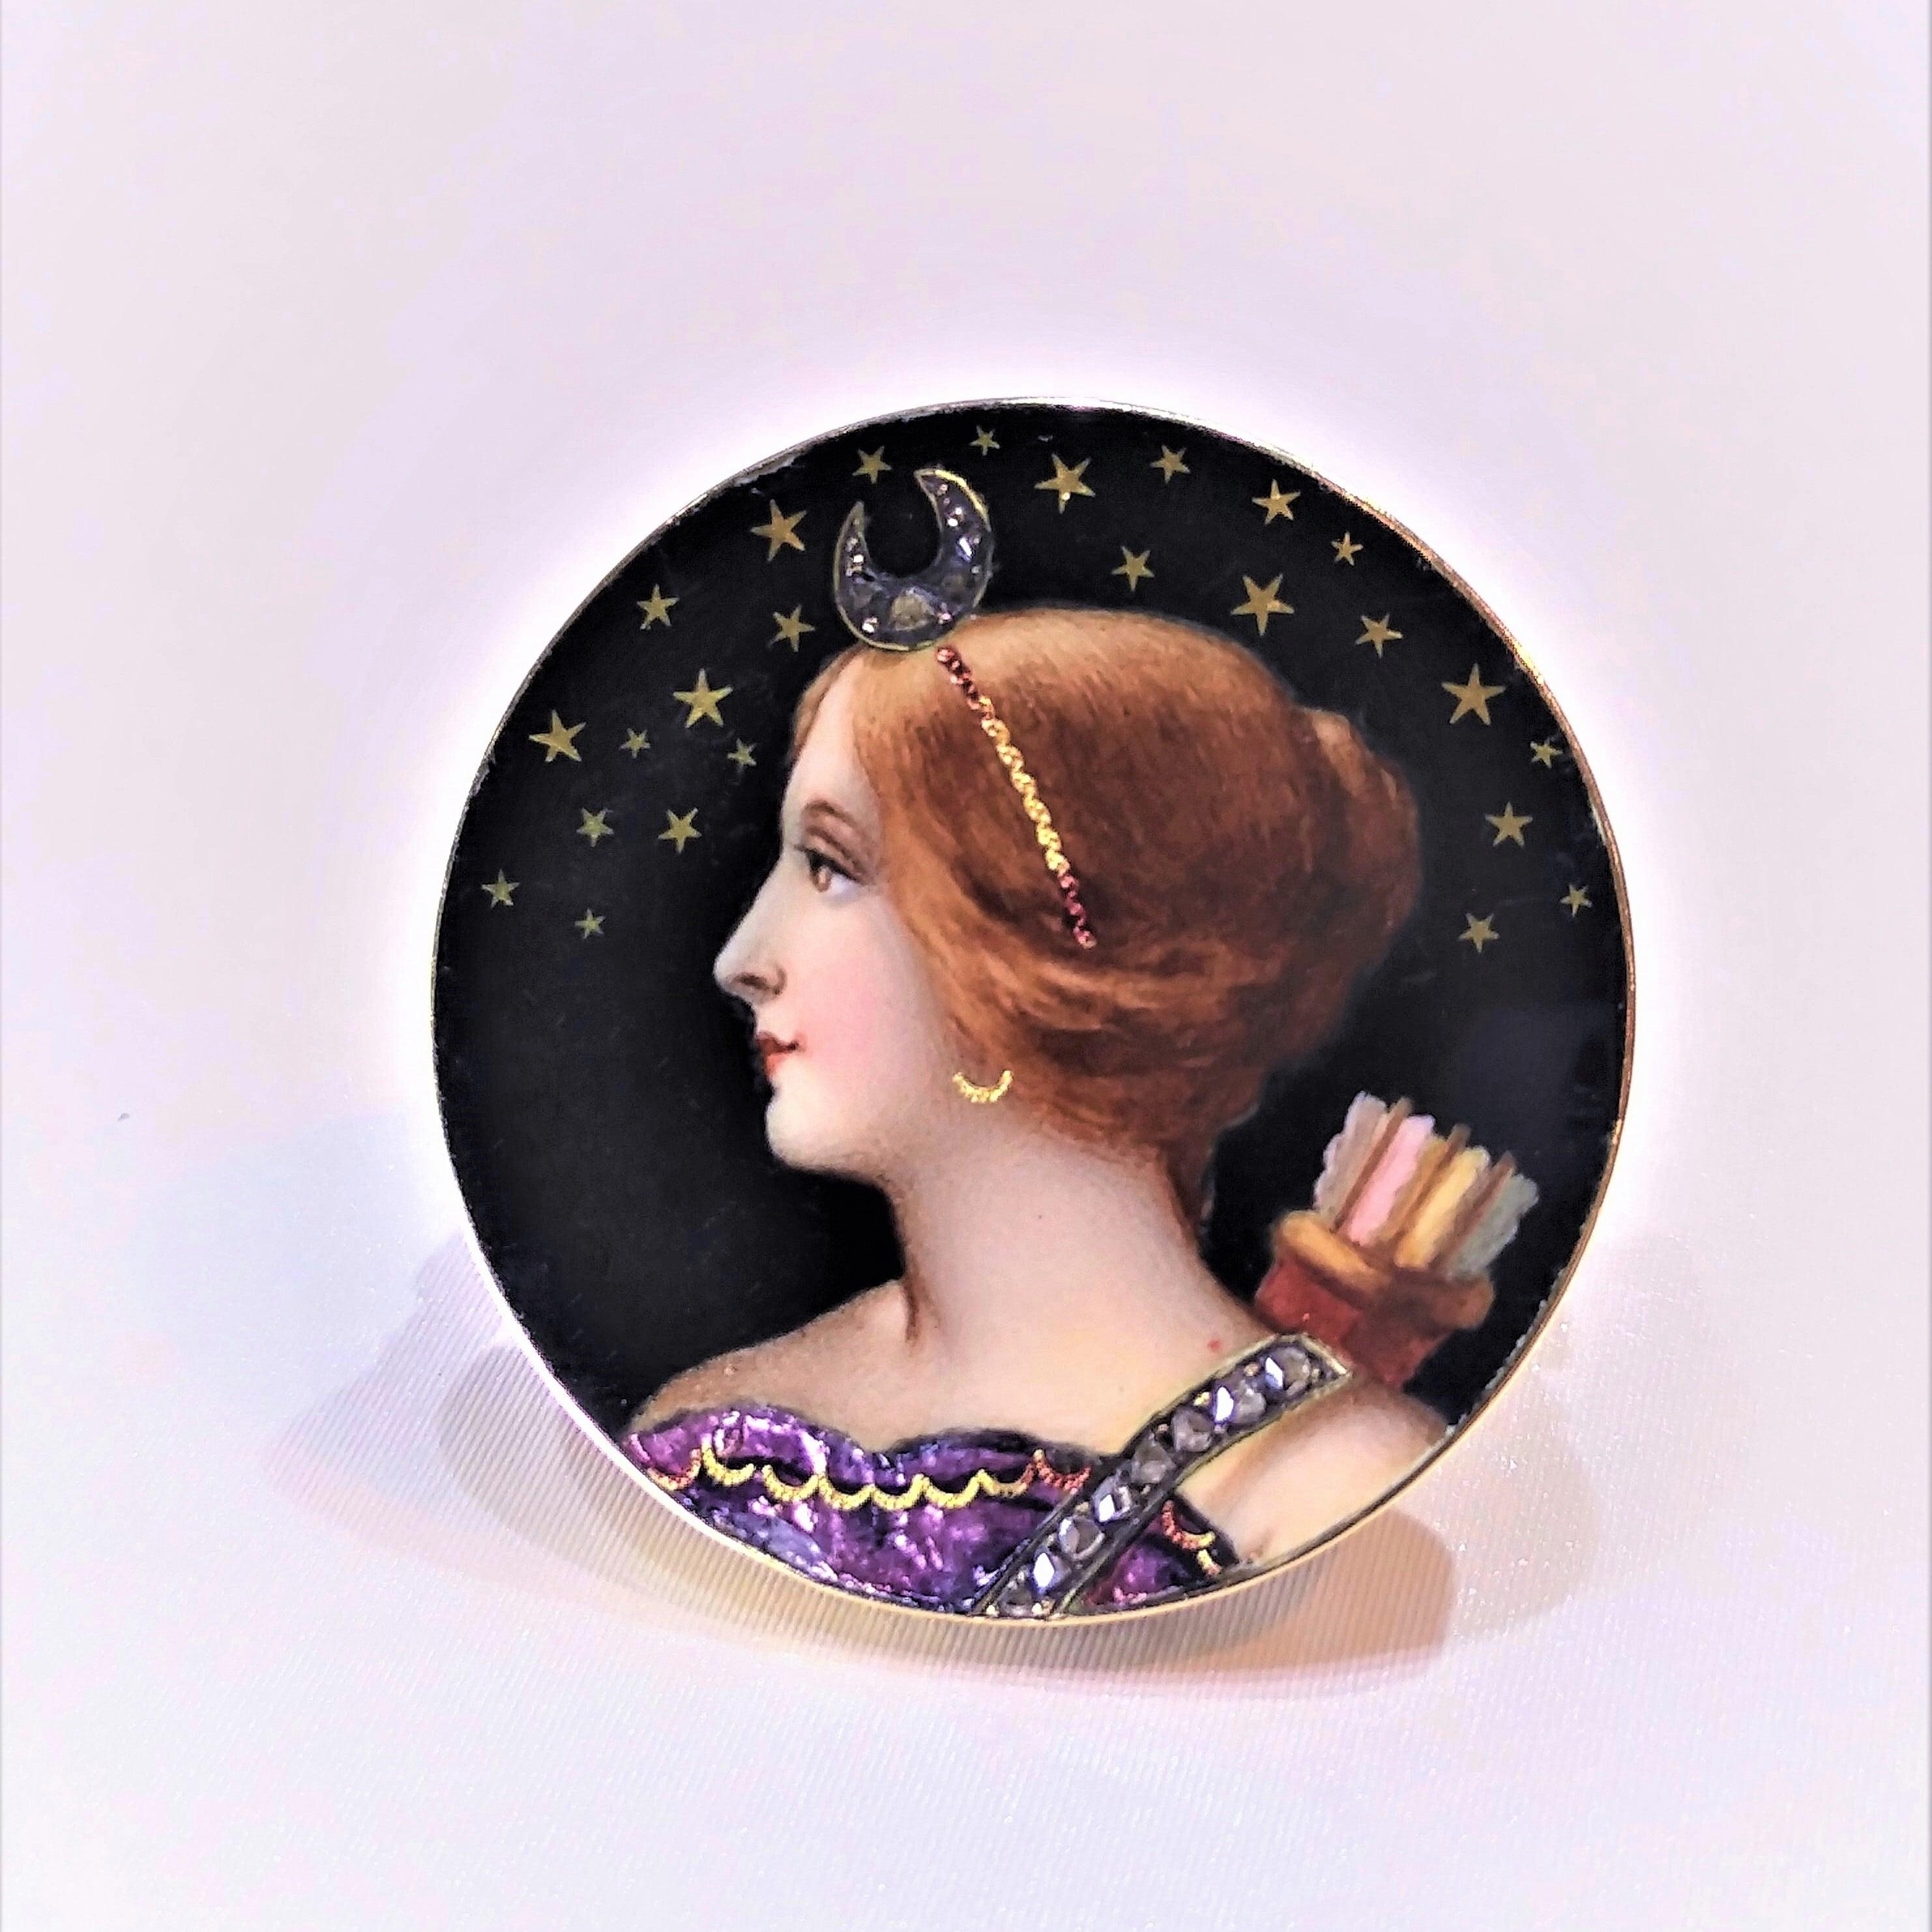 Diana (Artemis) Enamel Brooch  ダイアナ(アルテミス)エナメル ブローチ